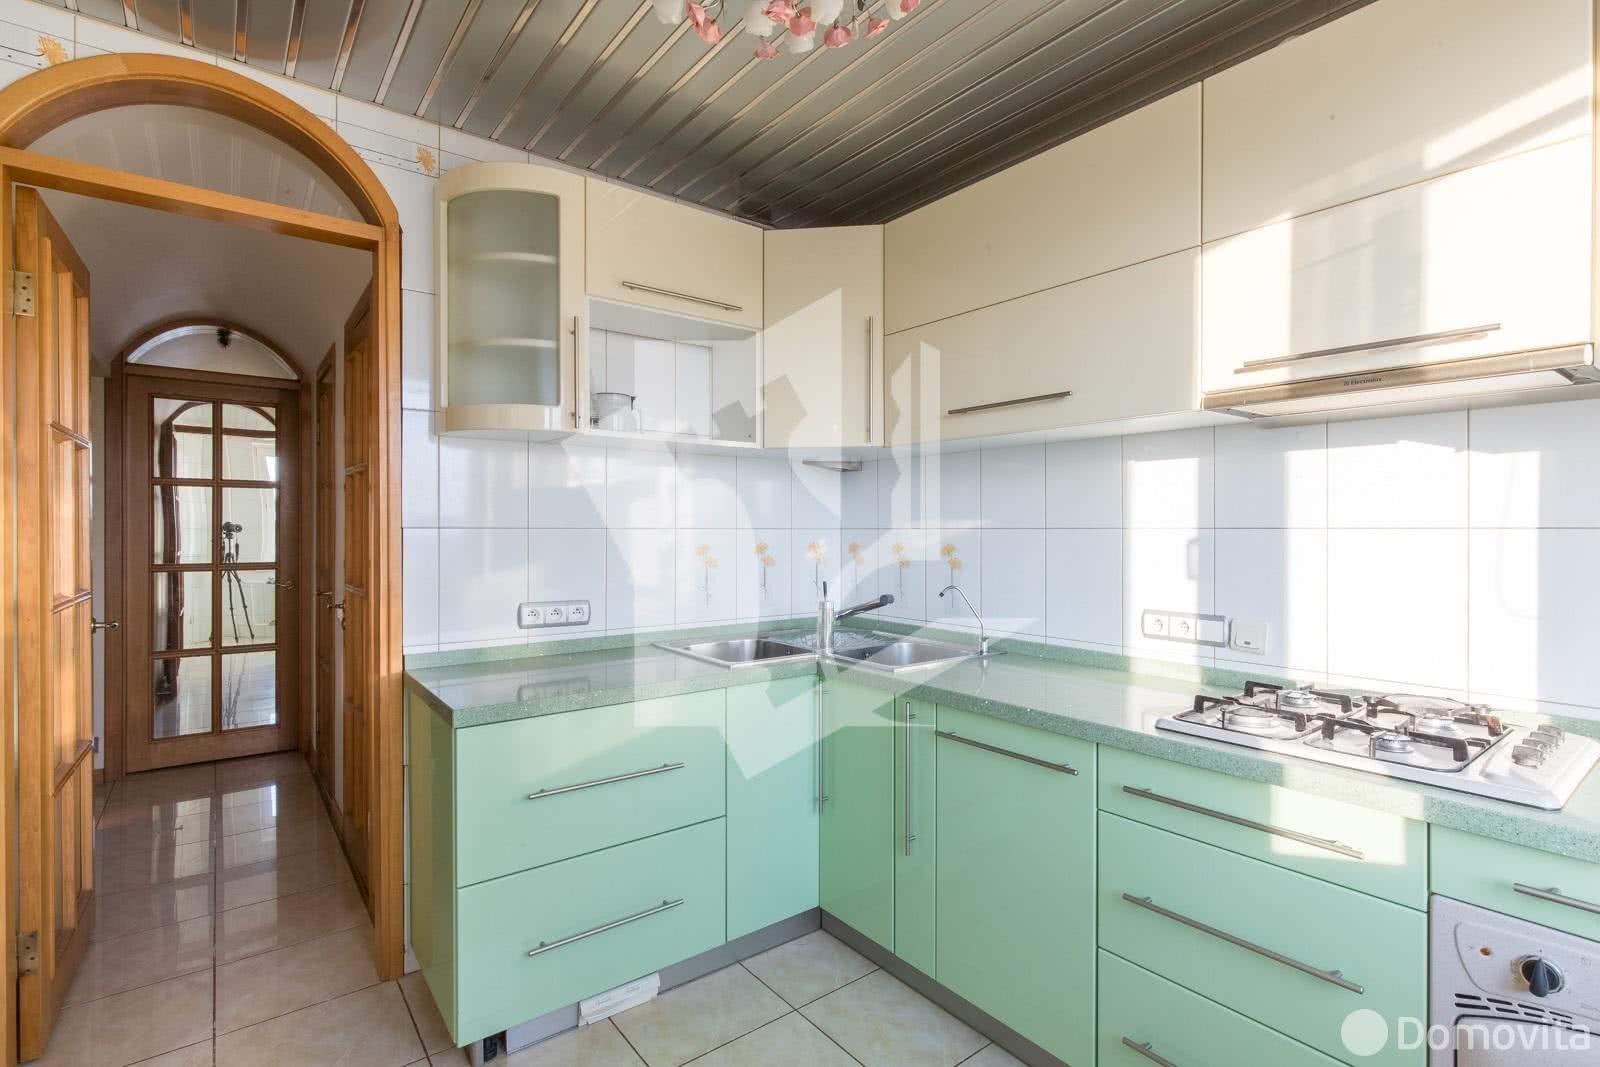 Купить 4-комнатную квартиру в Минске, ул. Пимена Панченко, д. 24 - фото 3